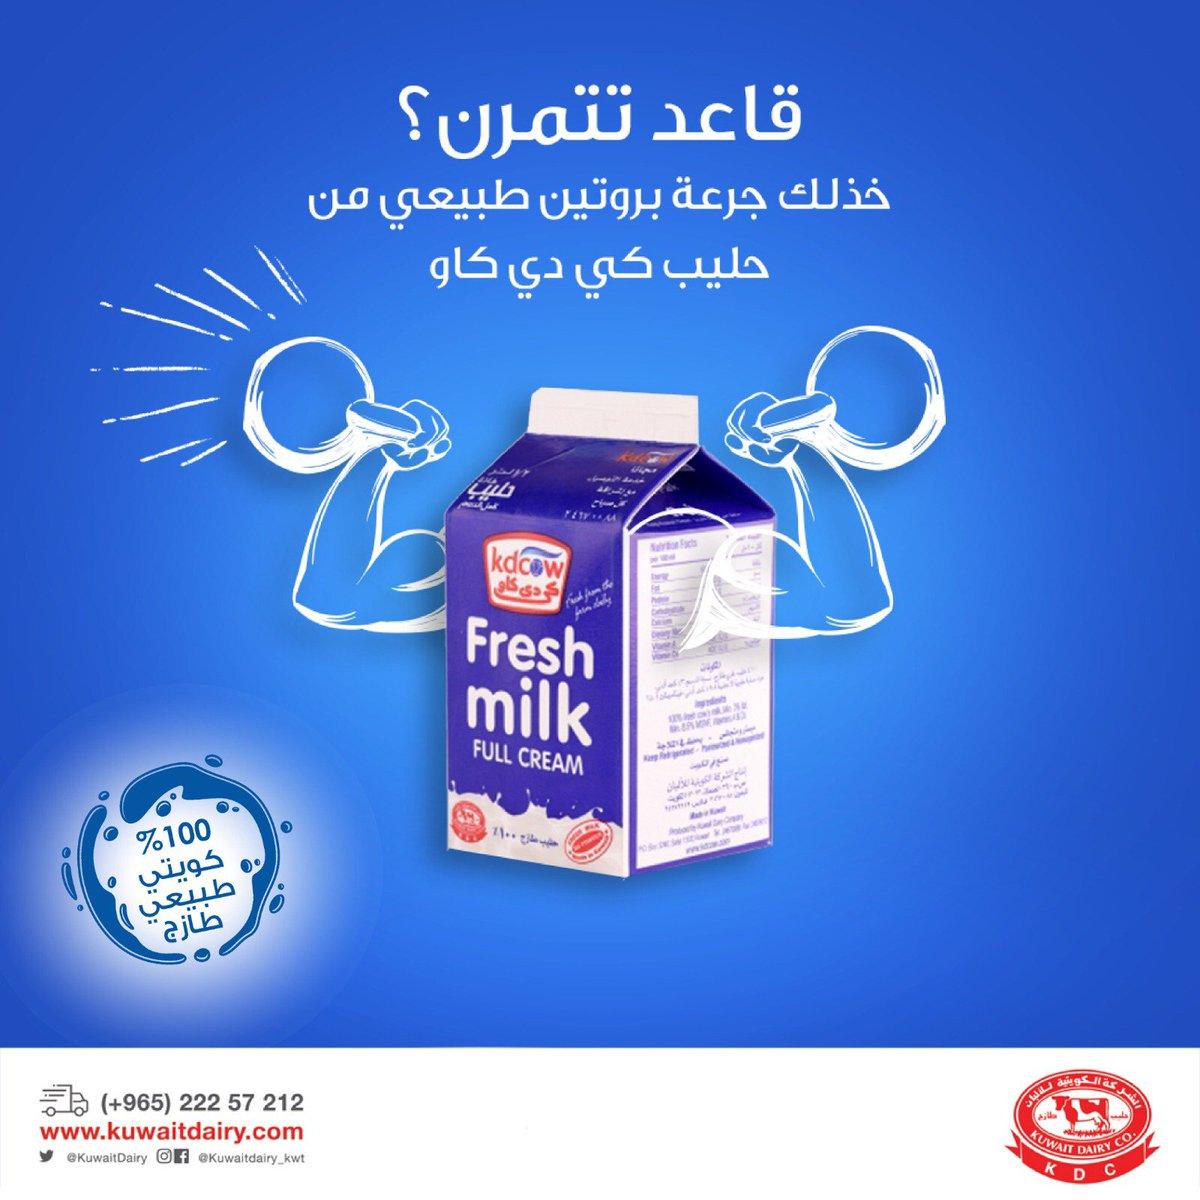 Kuwait Dairy på Twitter: